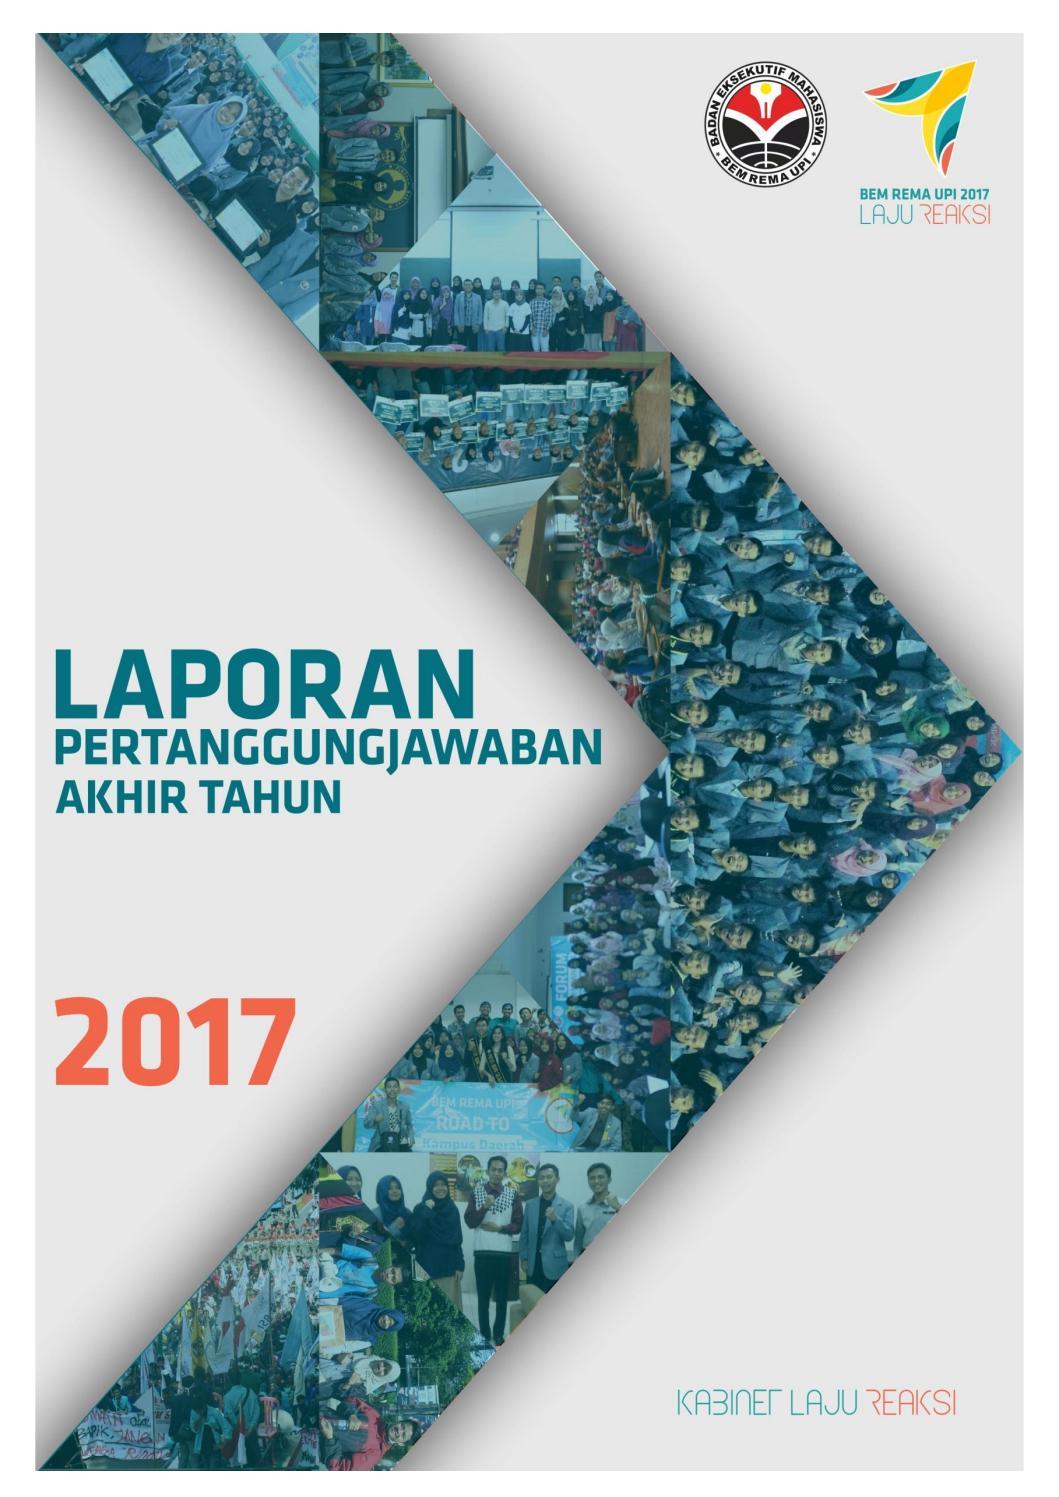 Laporan Pertanggungjawaban Akhir Tahun Bem Rema Upi 2017 By Bem Rema Upi Issuu